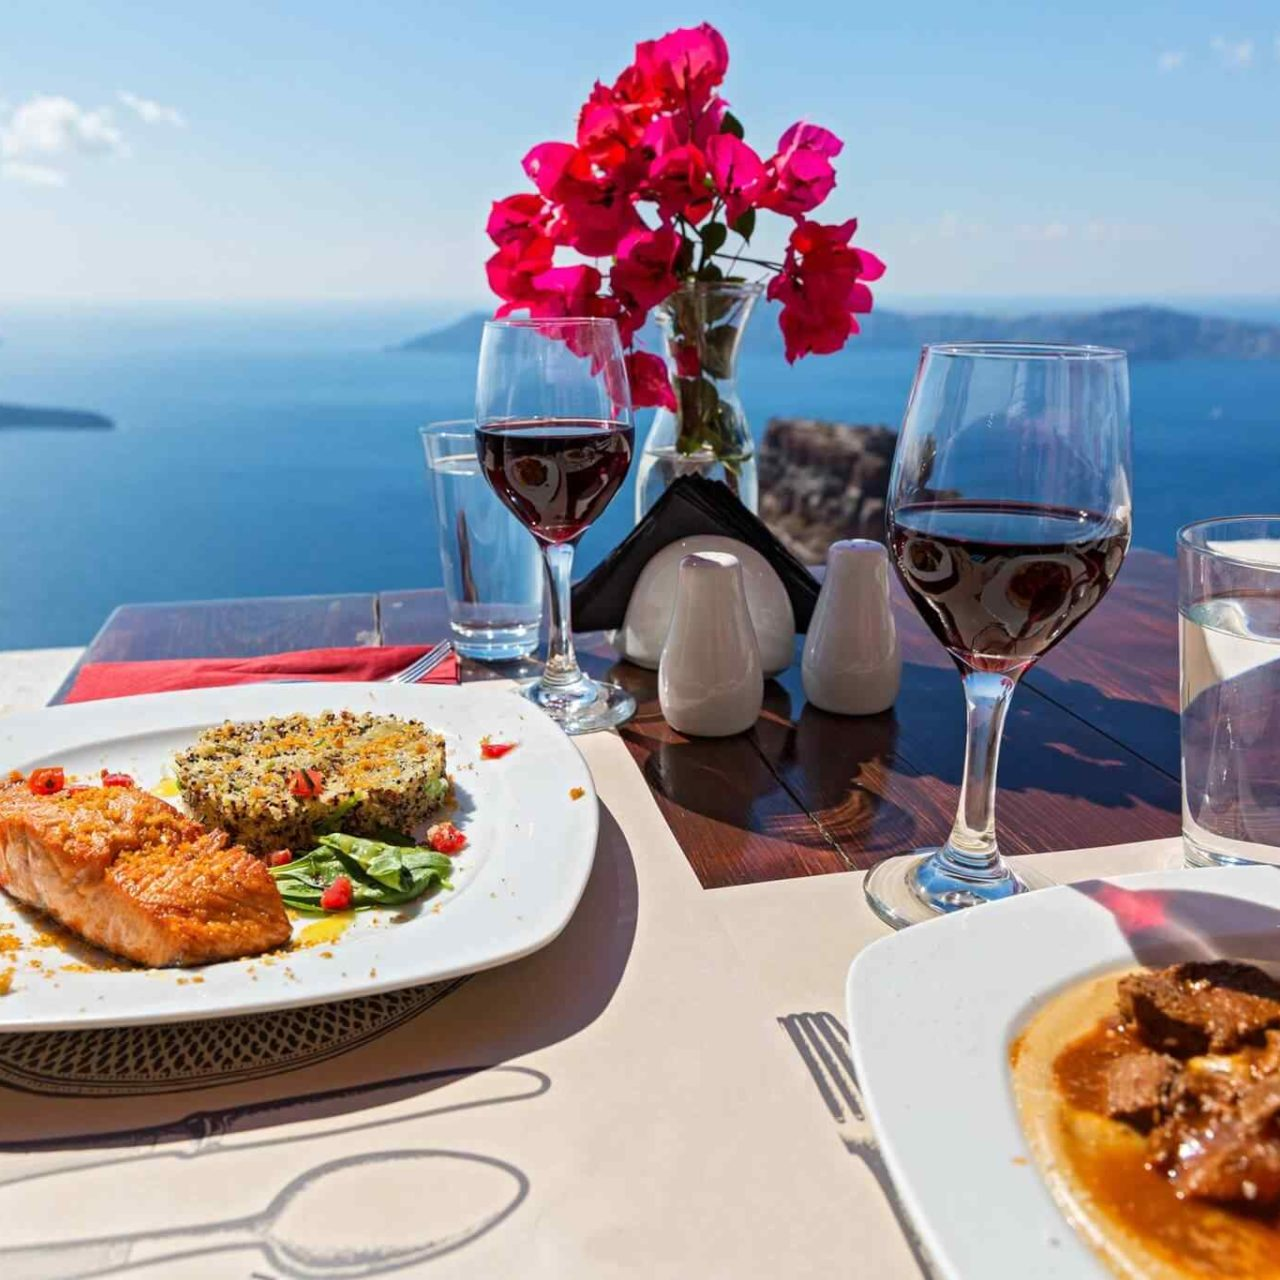 https://www.locfind.eu/wp-content/uploads/2017/10/restaurant-italian-25-1280x1280.jpg